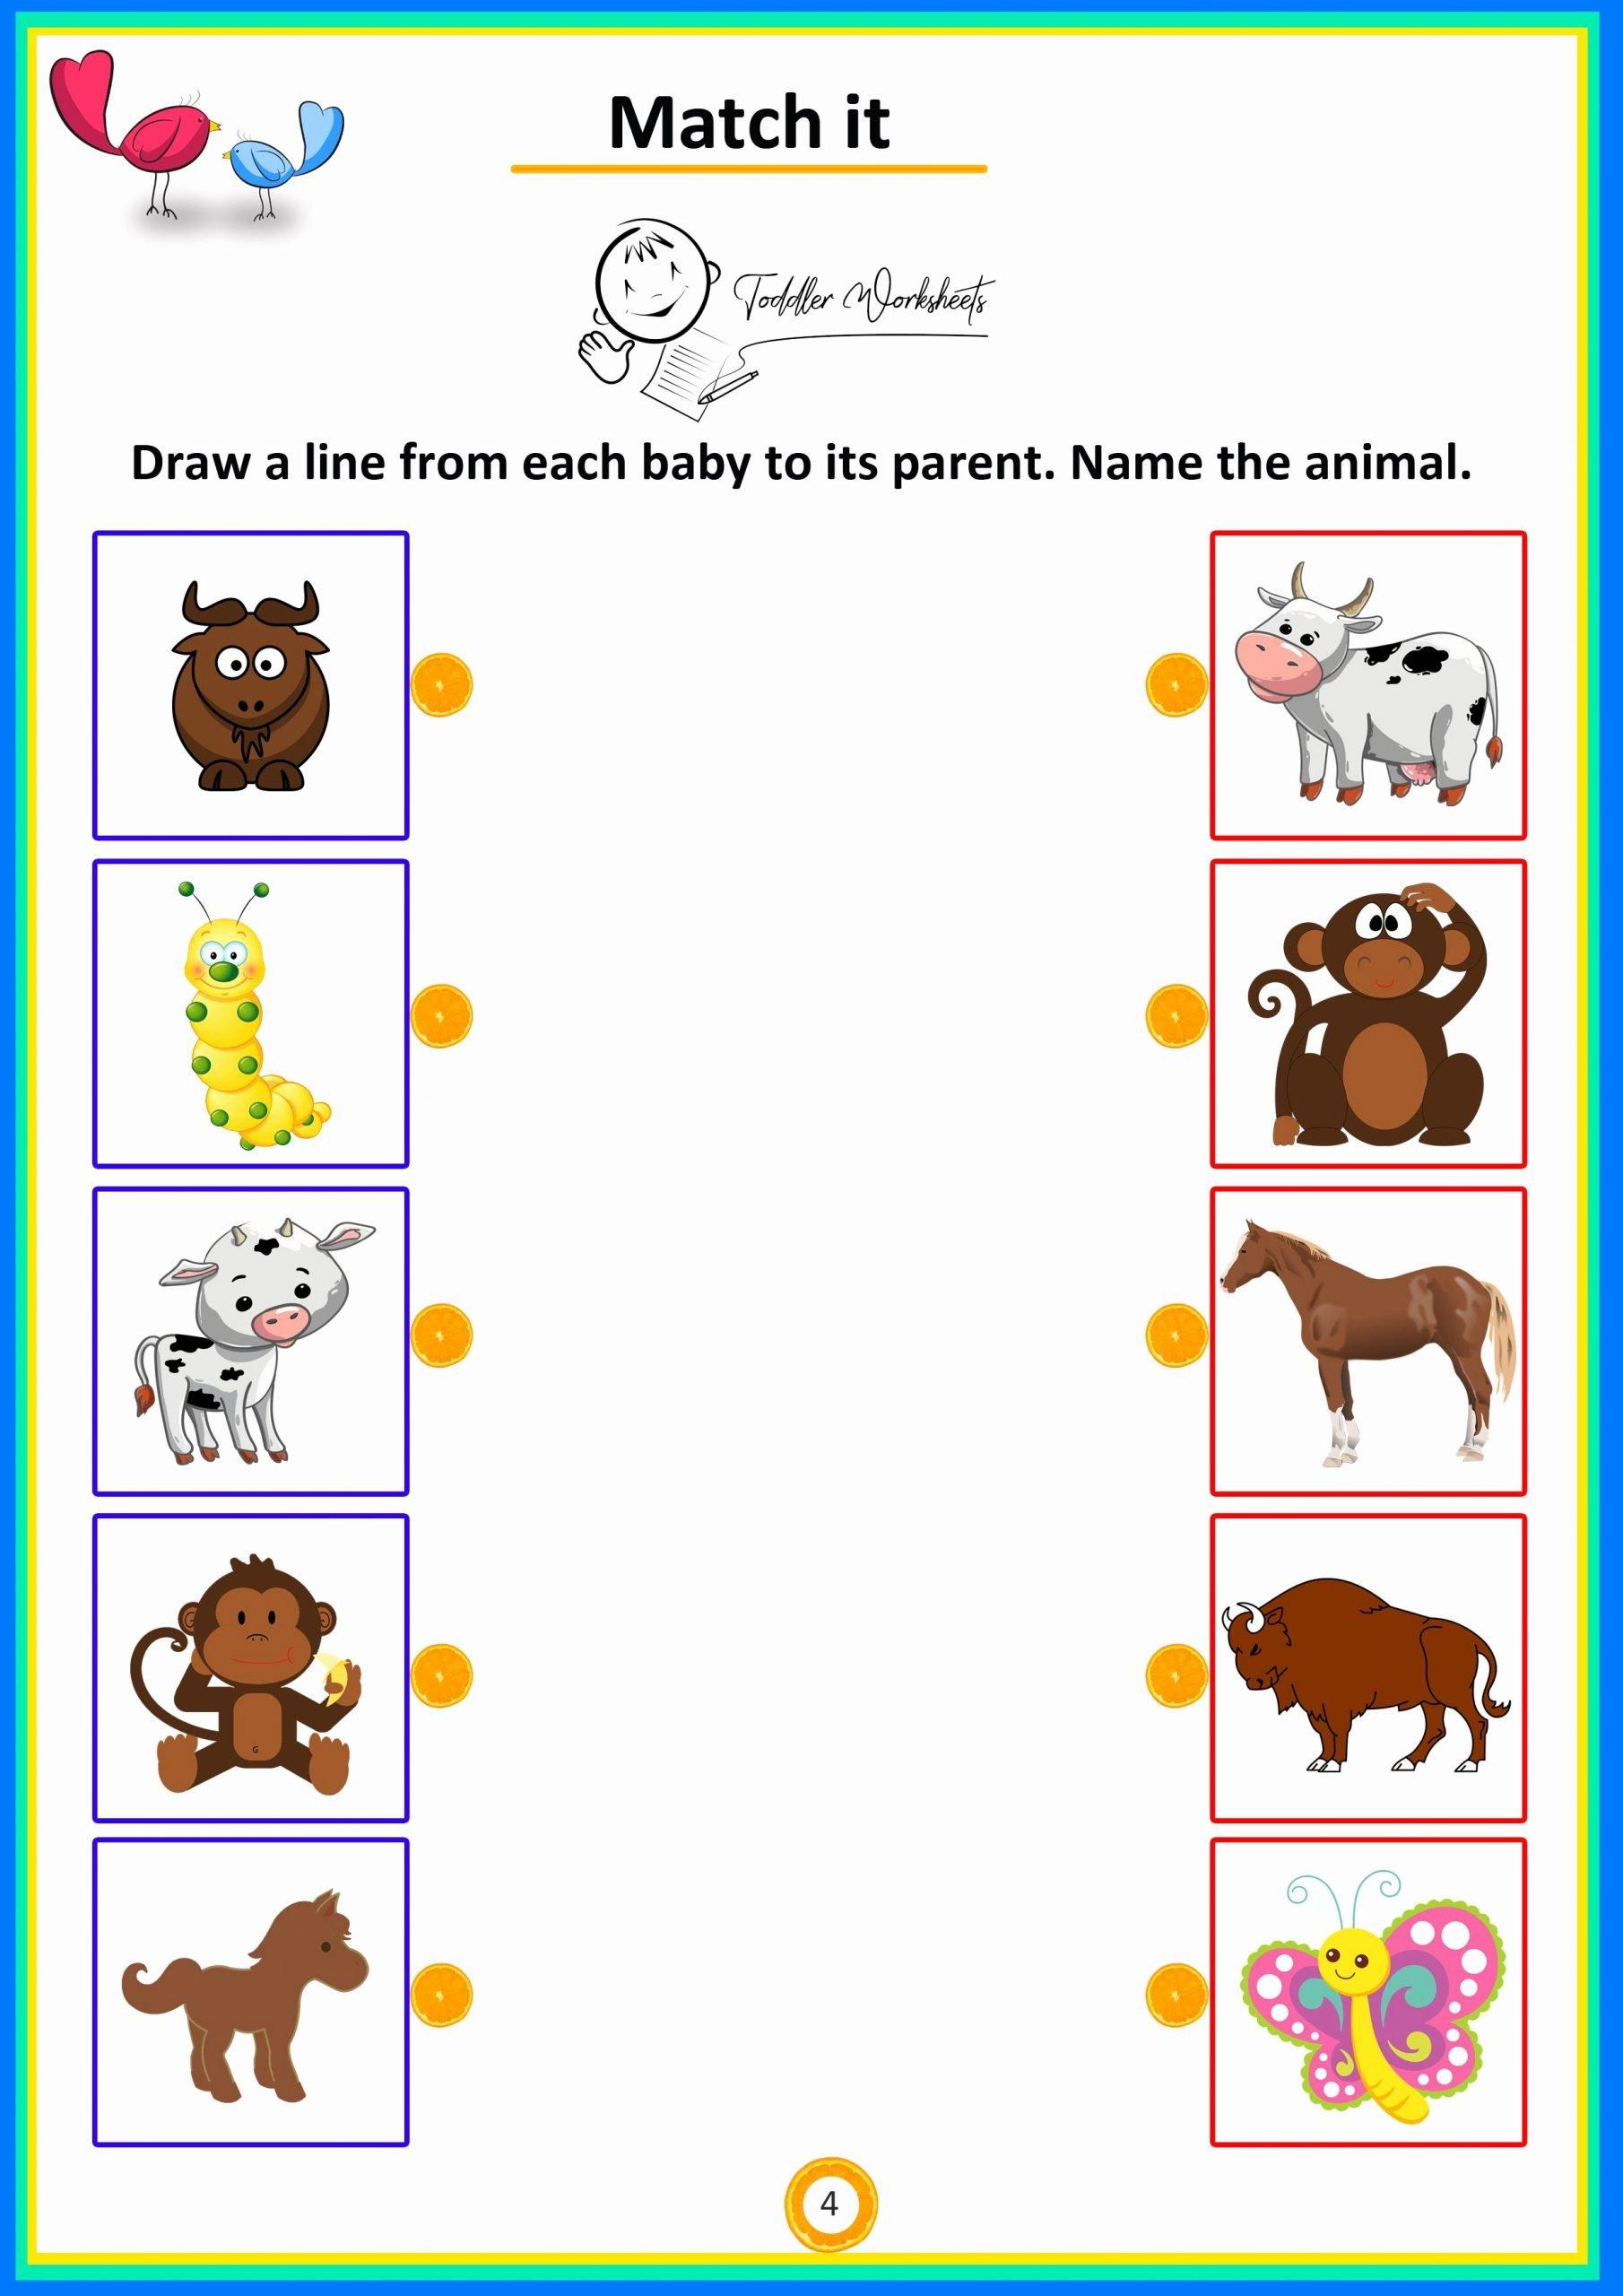 Simple Math Worksheets for Preschoolers Unique Match It 4 toddler Preschool Simple Math Worksheets